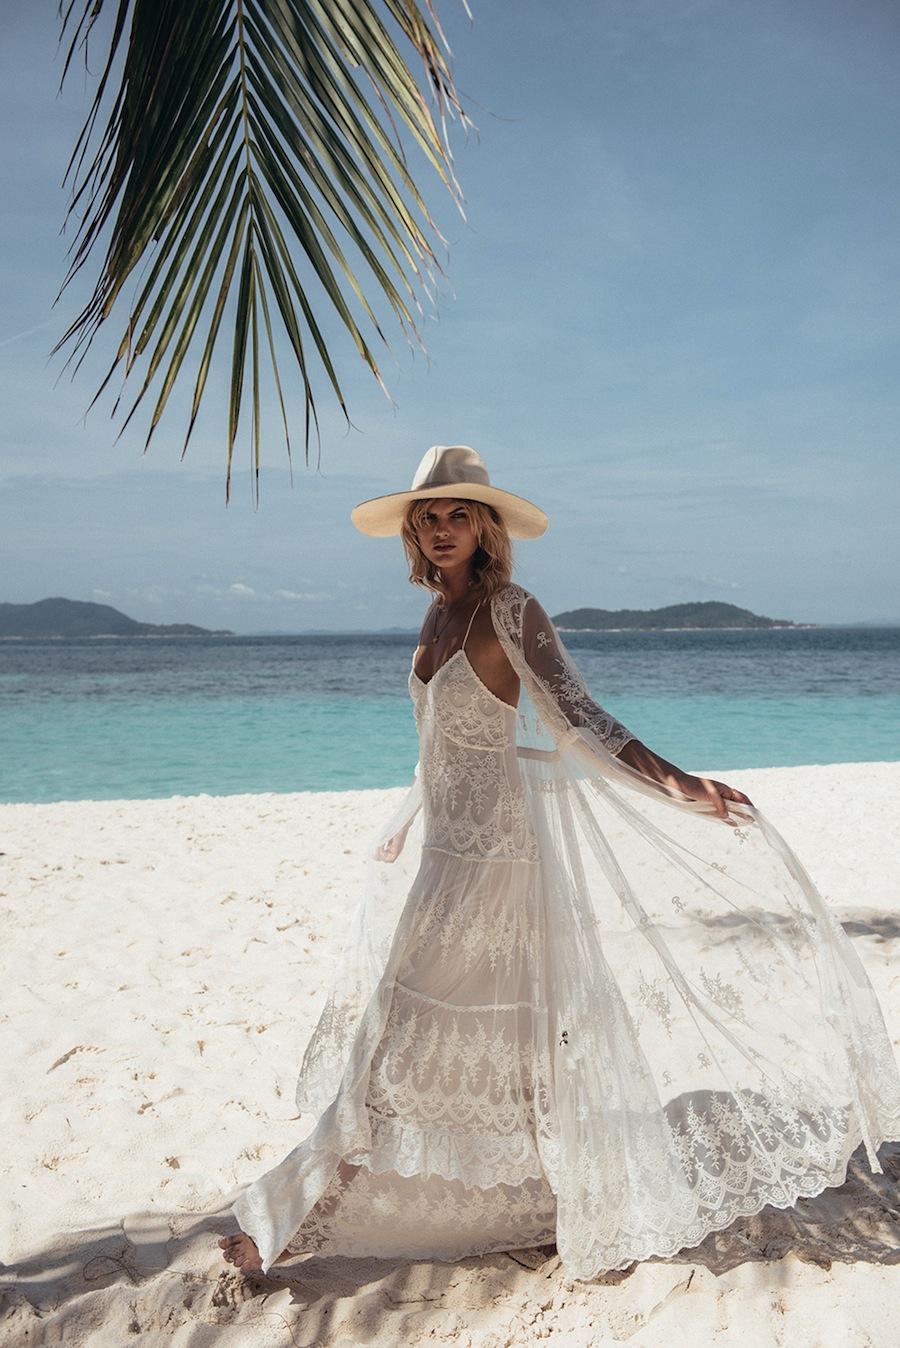 Spell Designs - Spell Bride Canyon Moon Dress